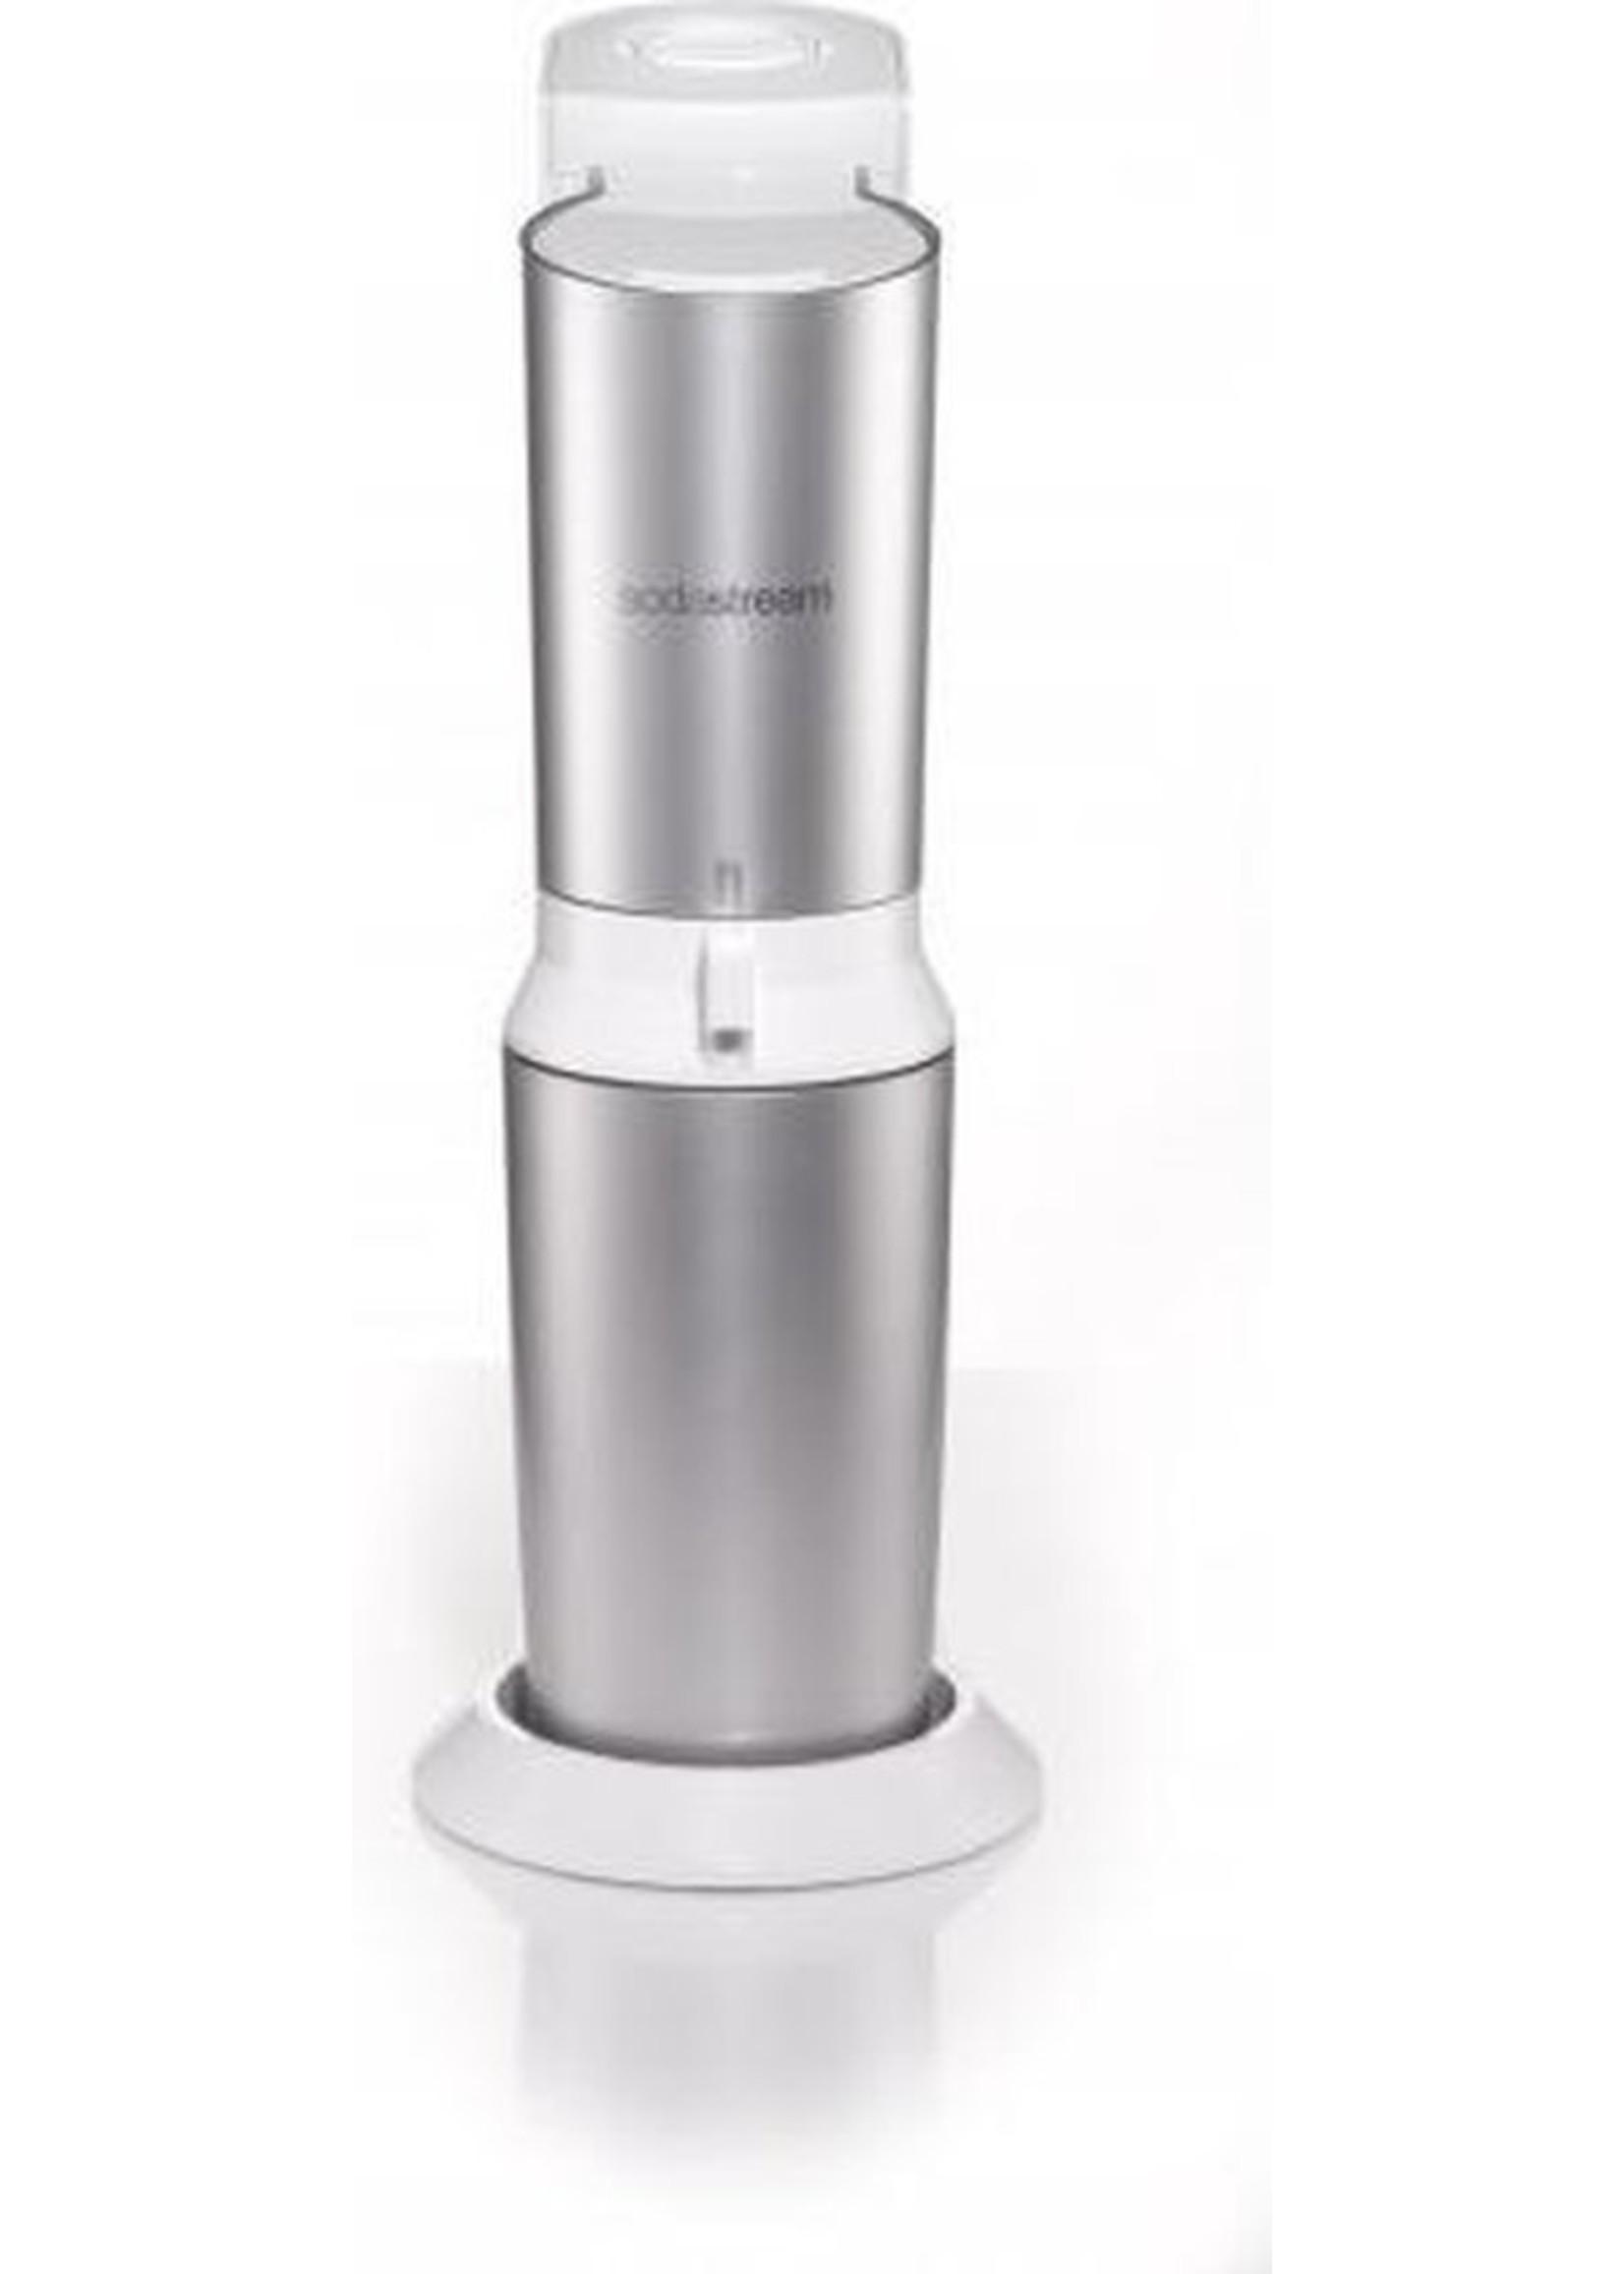 SodaStream SodaStream Crystal Megapack - Wit - Met gascilinder en 2 karaffen